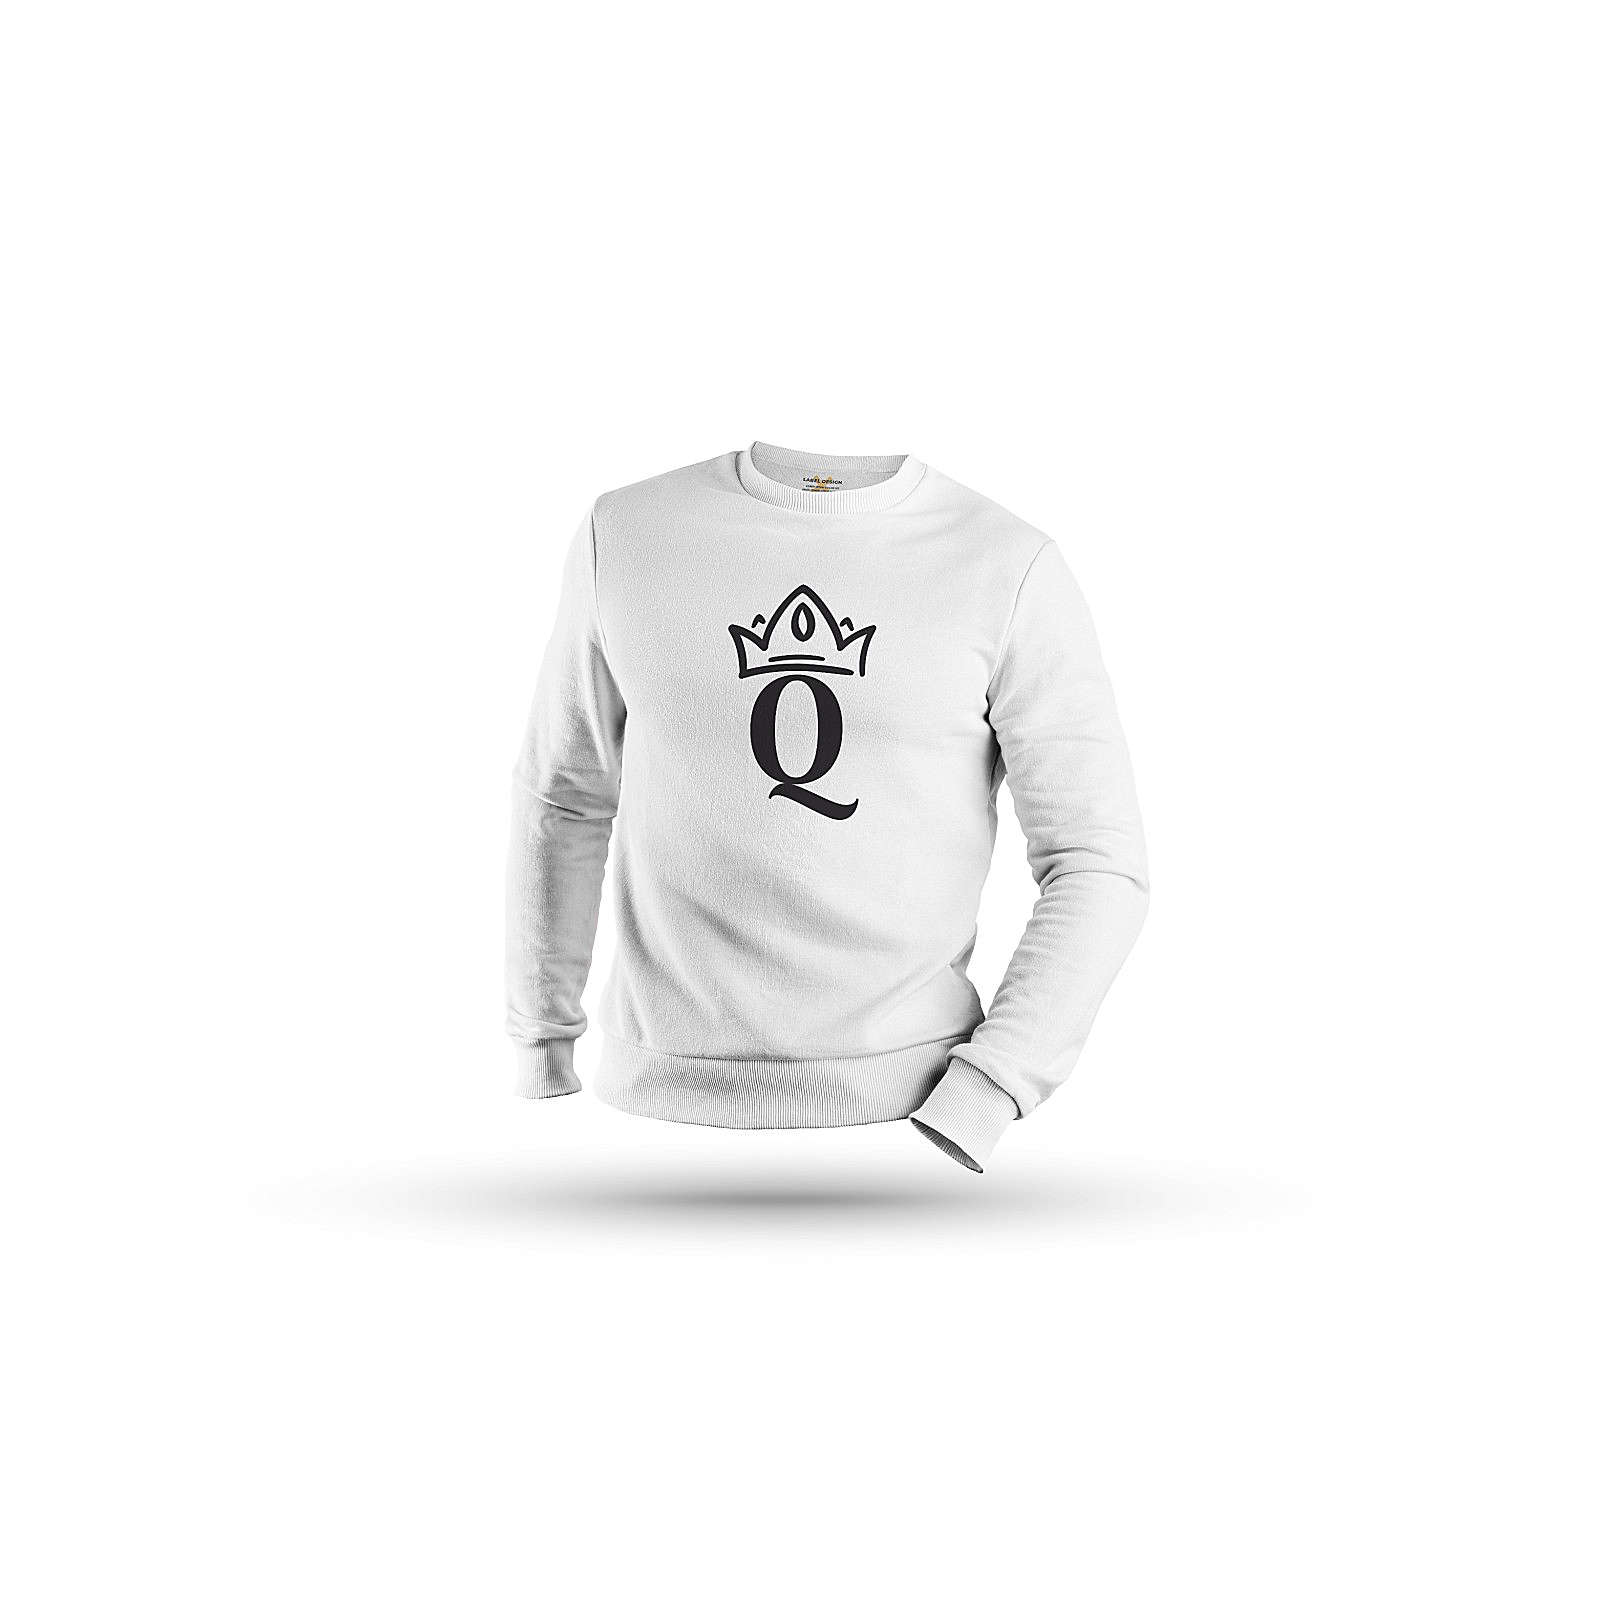 mamino Damen Sweatshirt -King & Queen Couple Sweatshirts weiß Damen Gr. 40